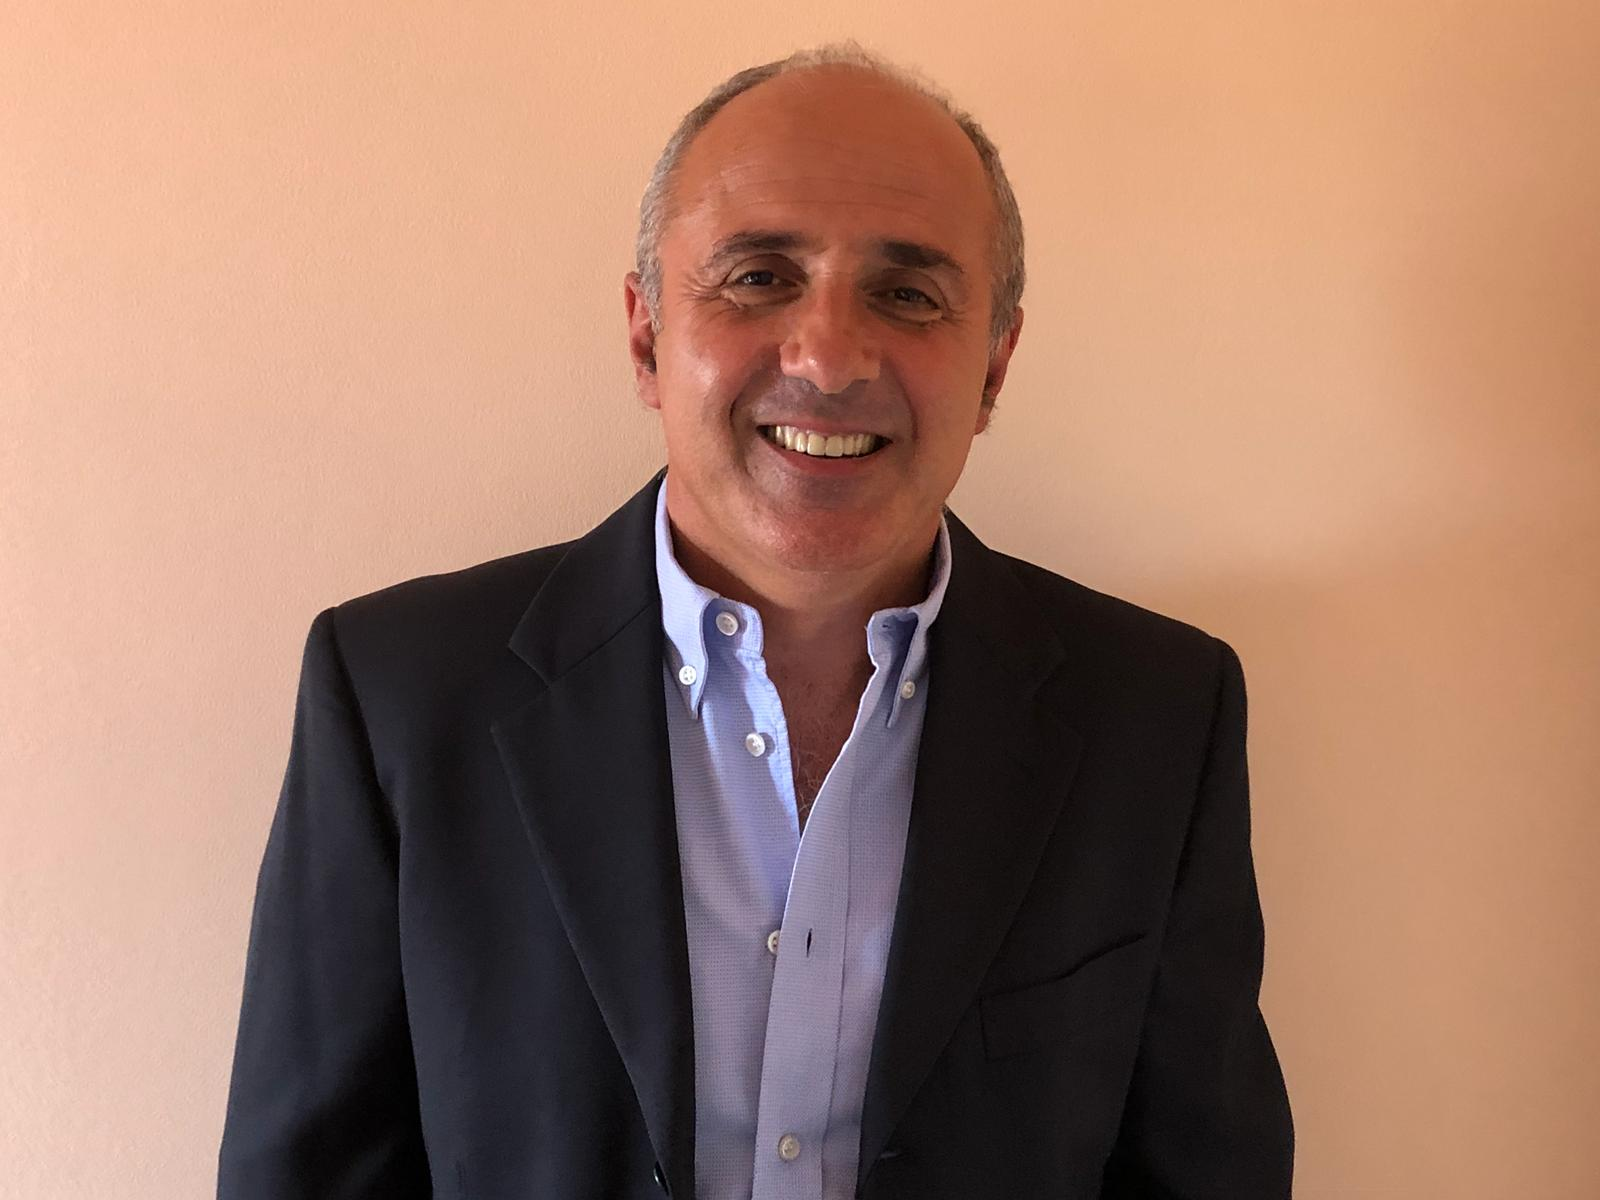 Messaggerie Catania - Maurizio Ciancio